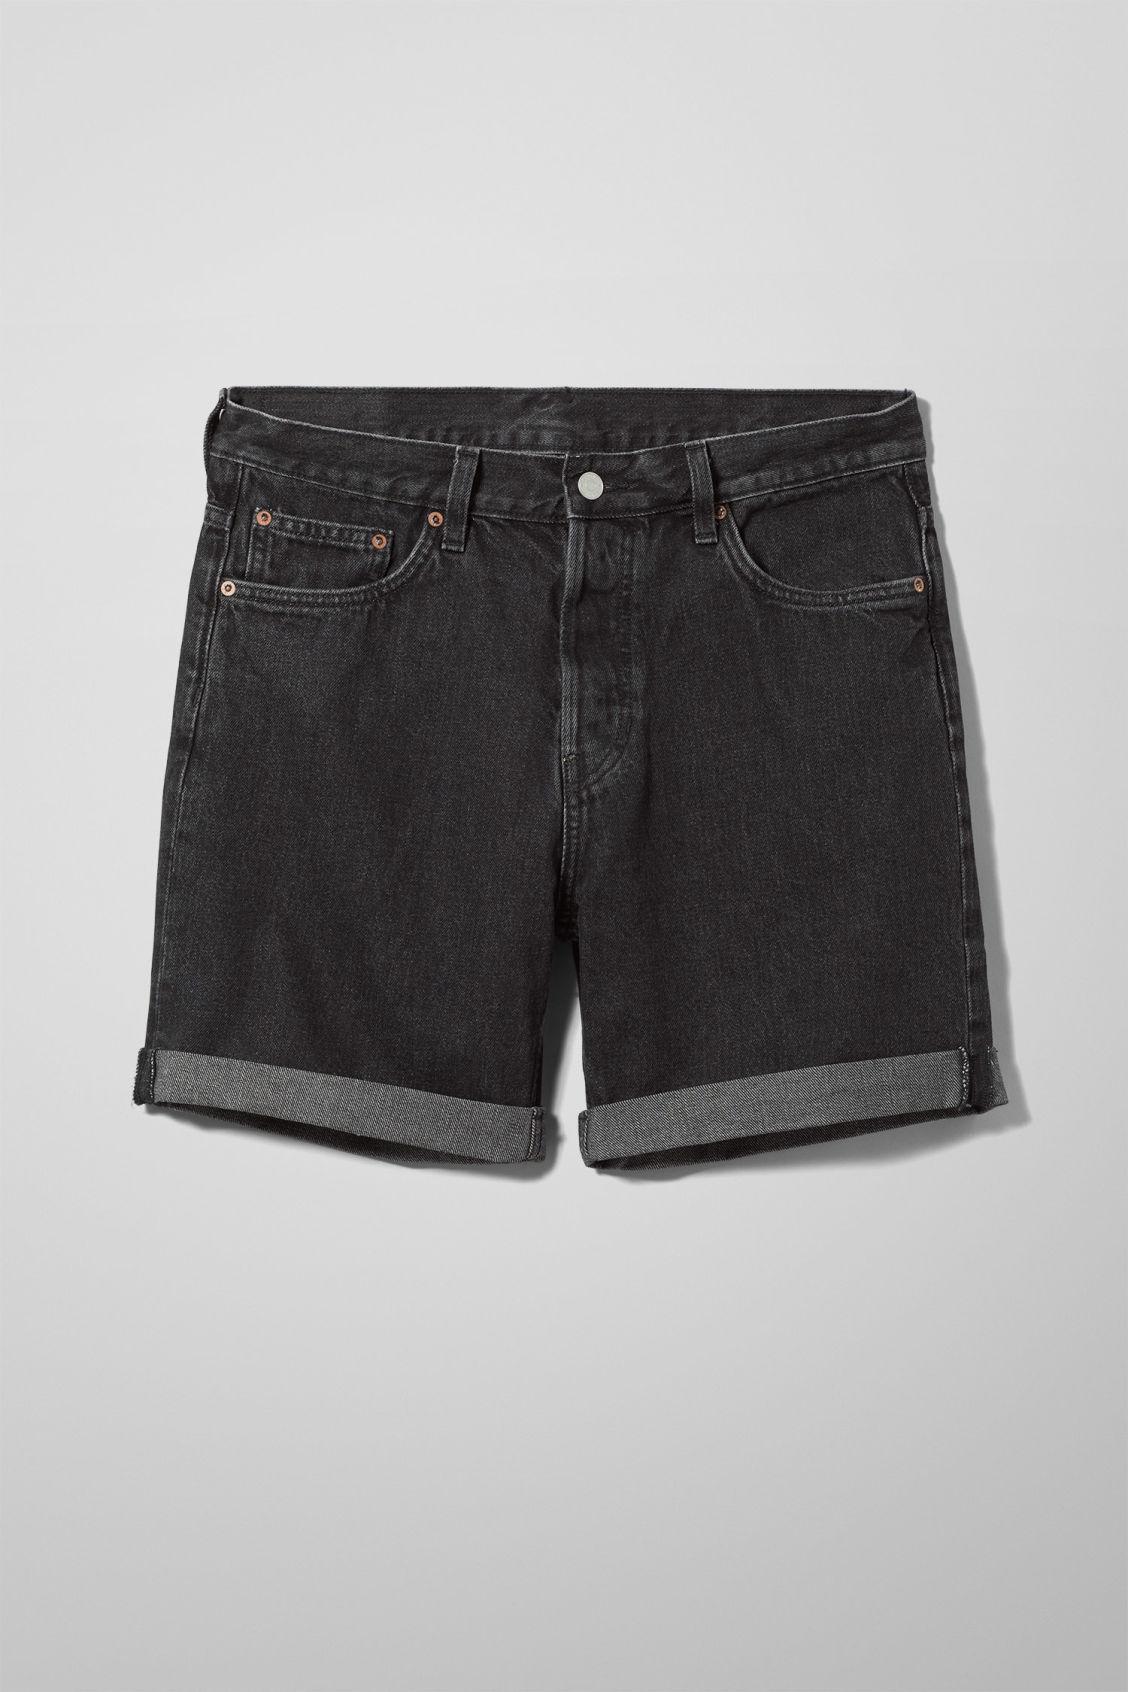 Vacant Trotter Black Shorts - Black